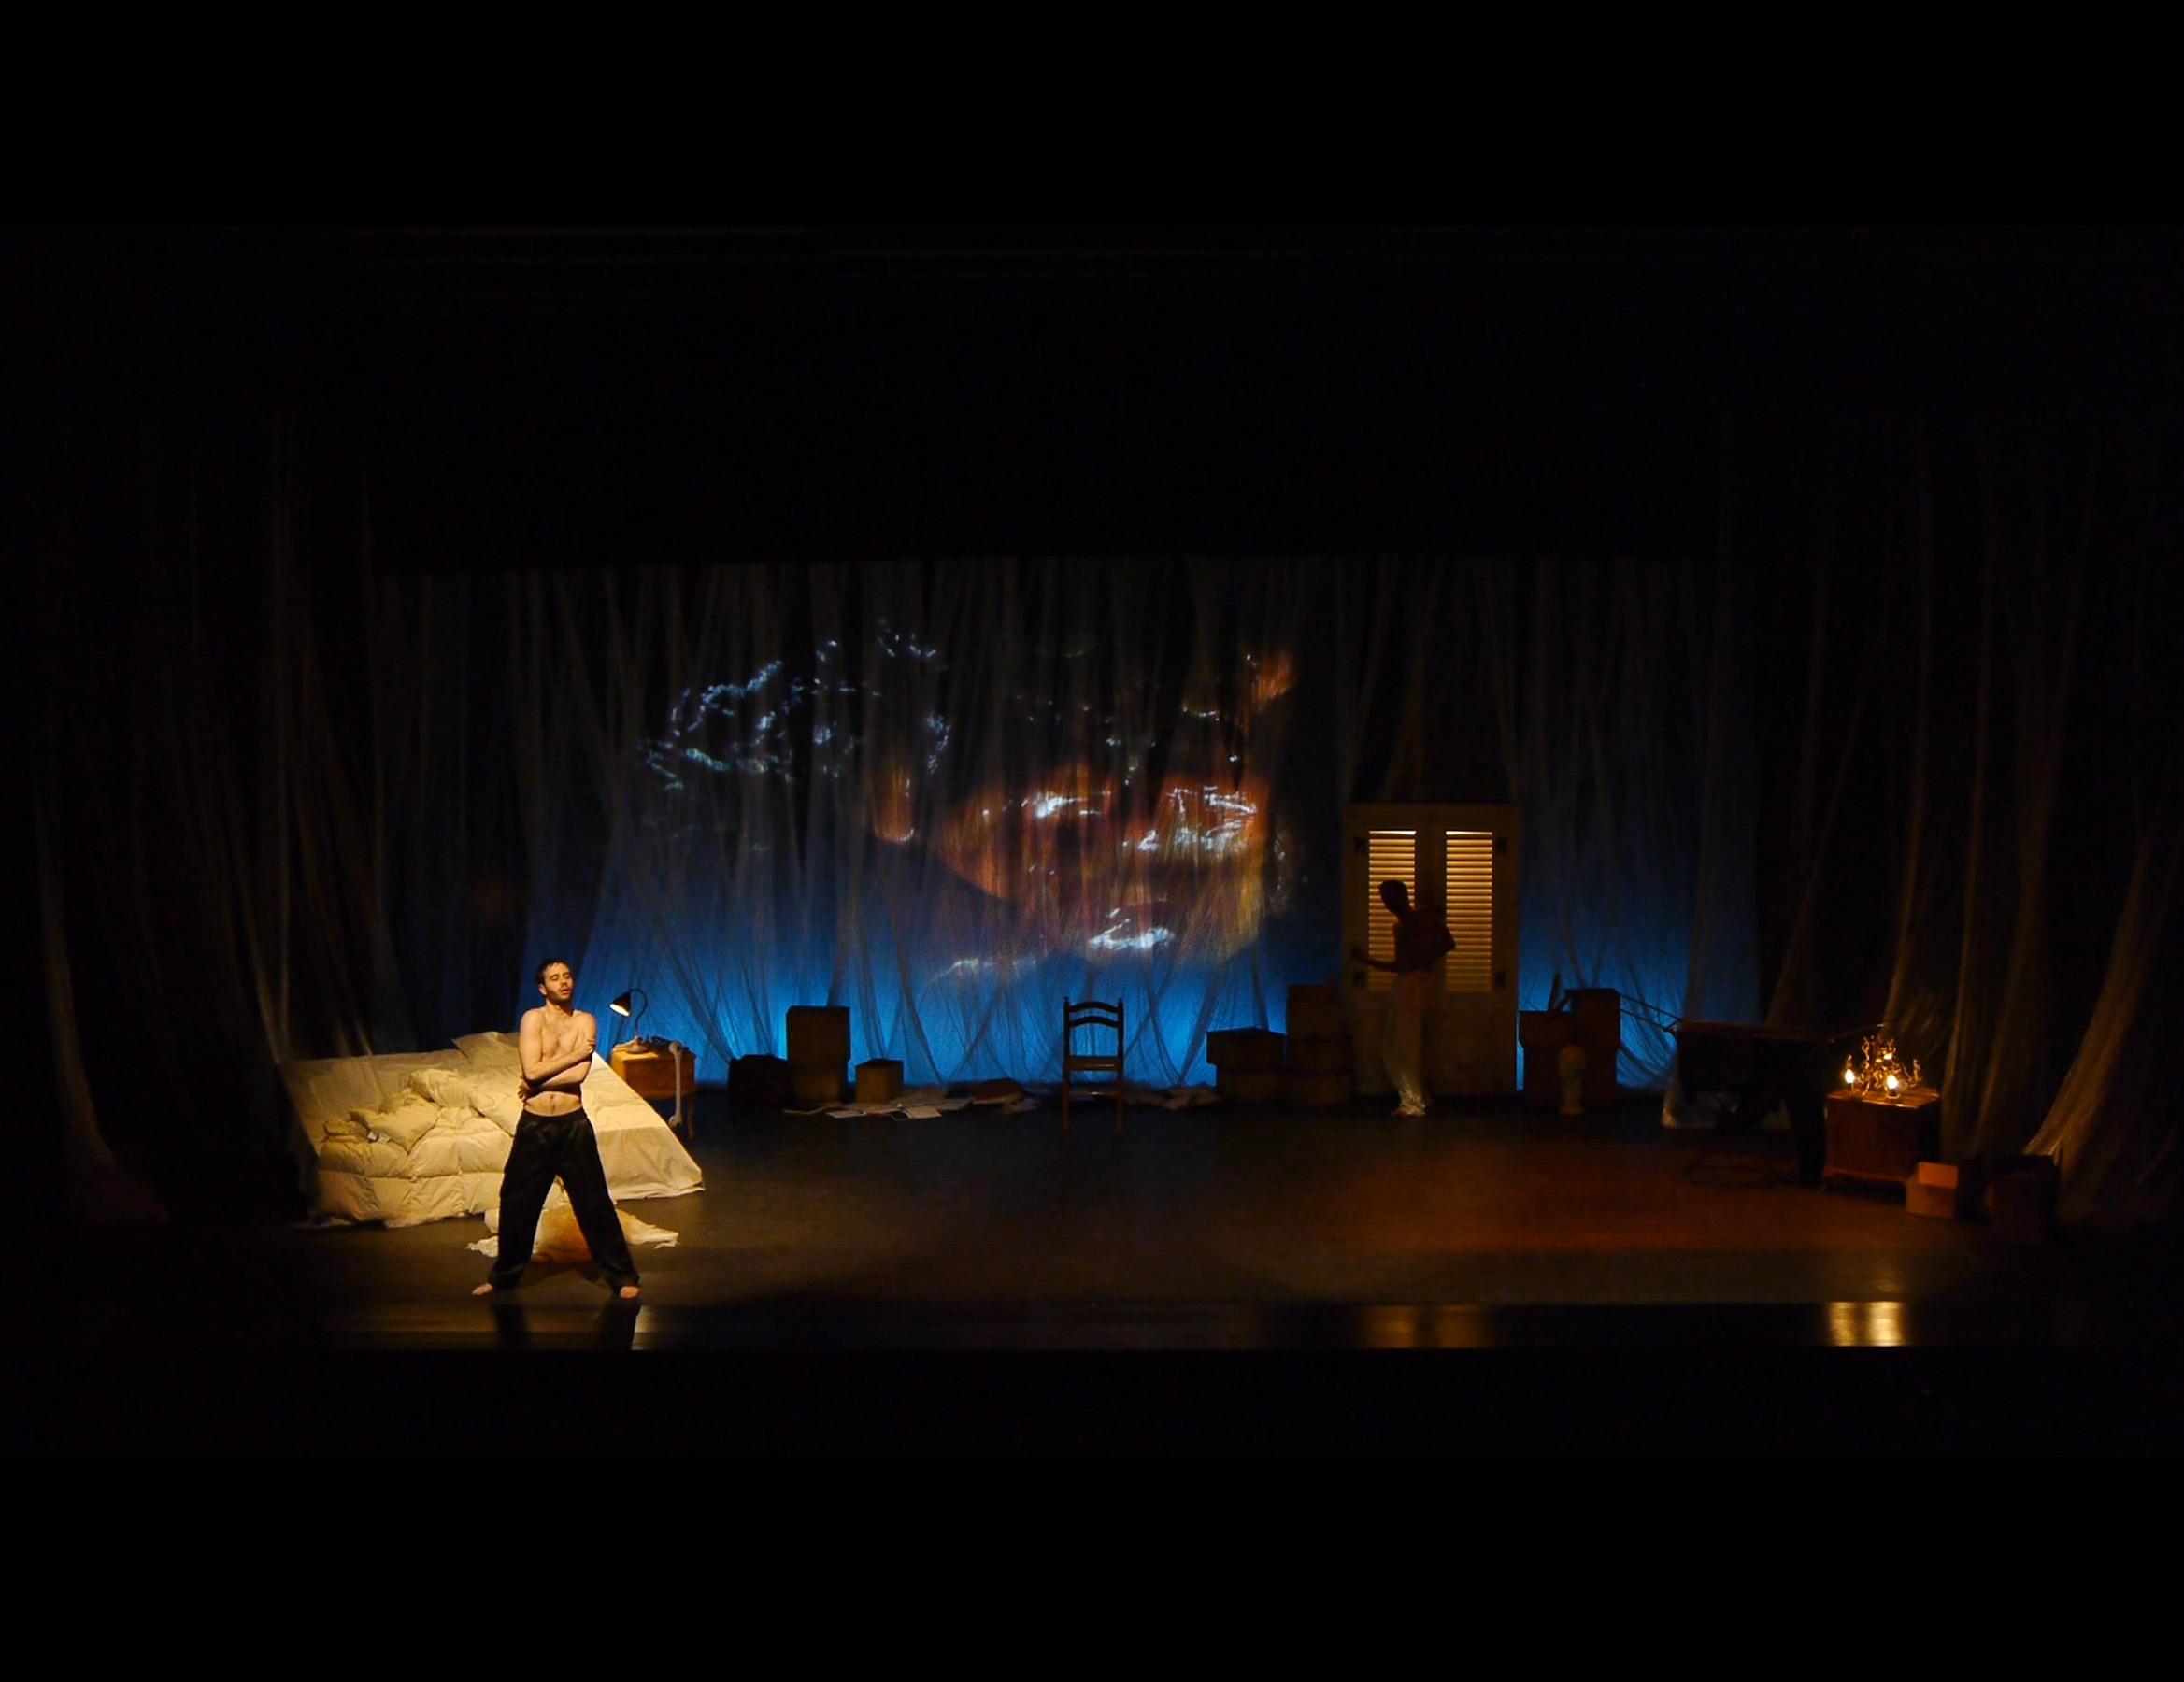 Hugo-Alonso-Estomago-Teatro-10.jpg